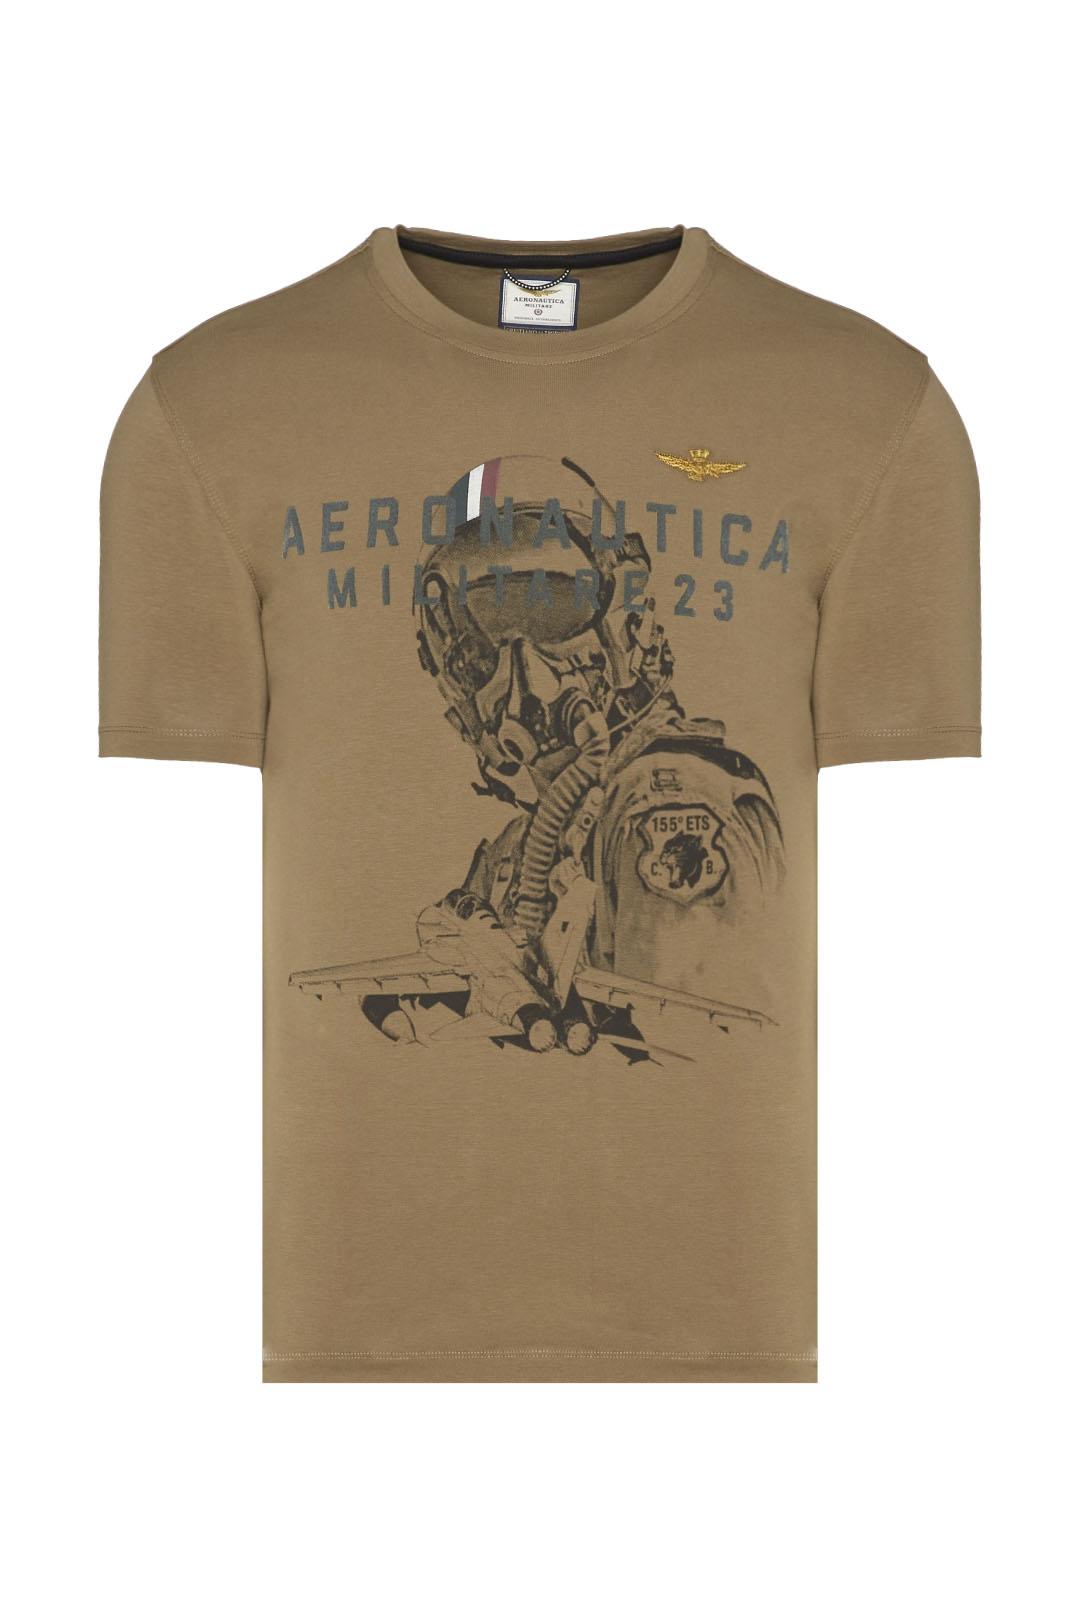 T-shirt stampa ad acqua                  1